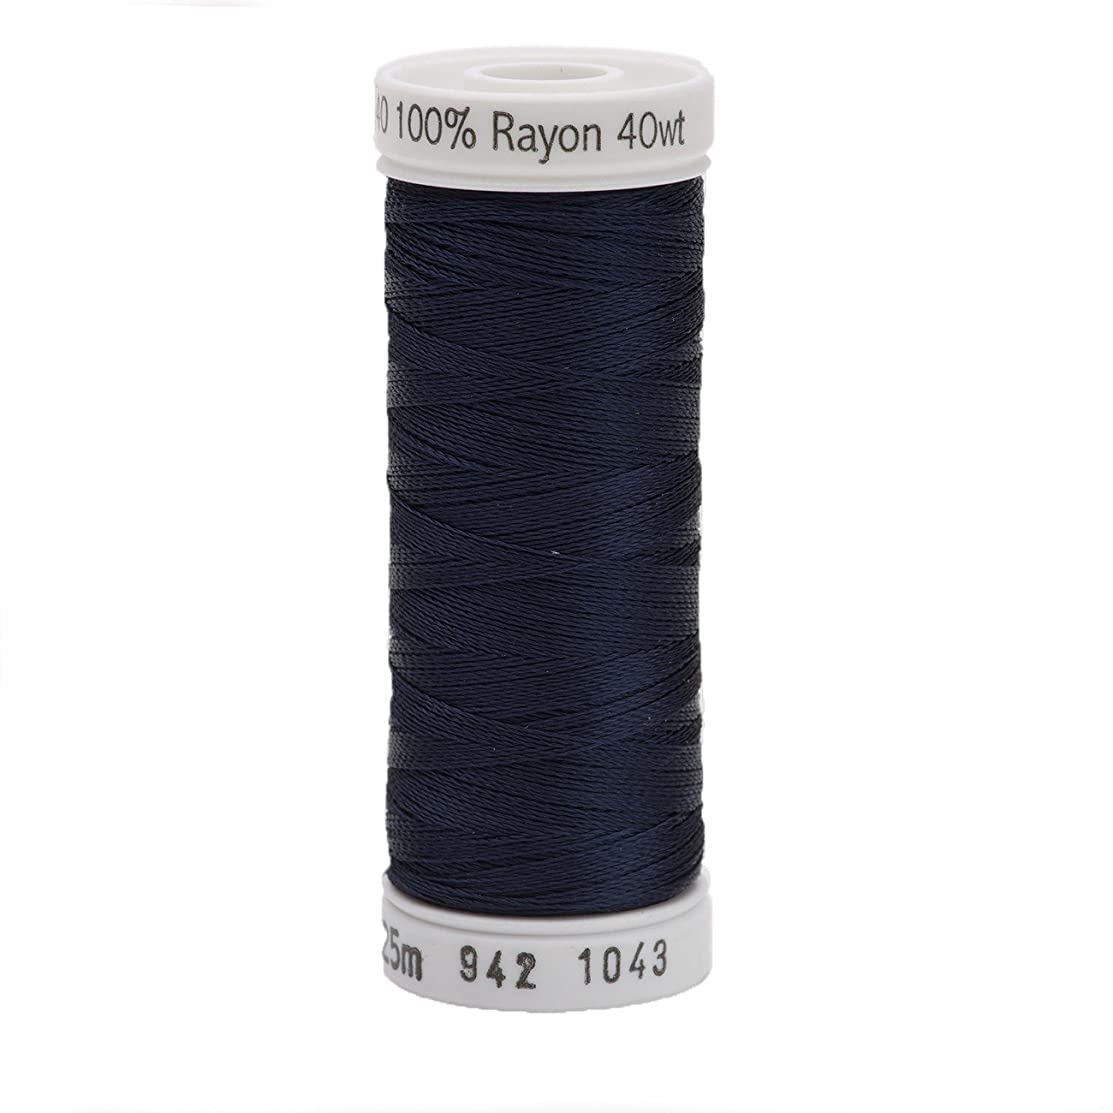 Sulky 942-1043 Rayon Thread for Sewing, 250-Yard, Dark Navy